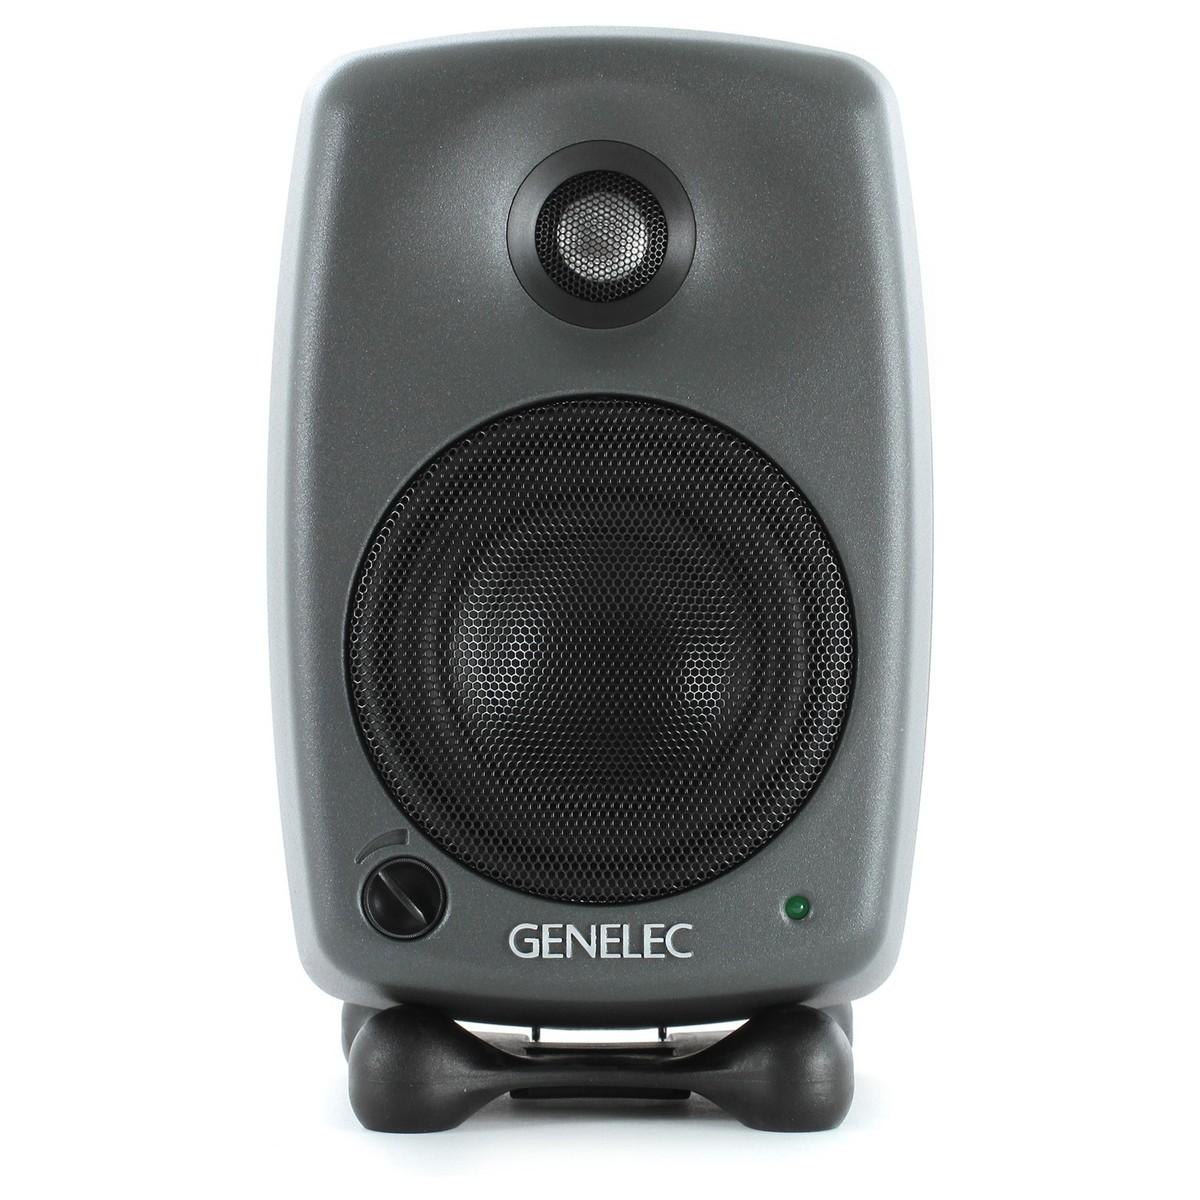 Image of Genelec 8020C Bi-Amplified Studio Monitor Dark Grey (Single)